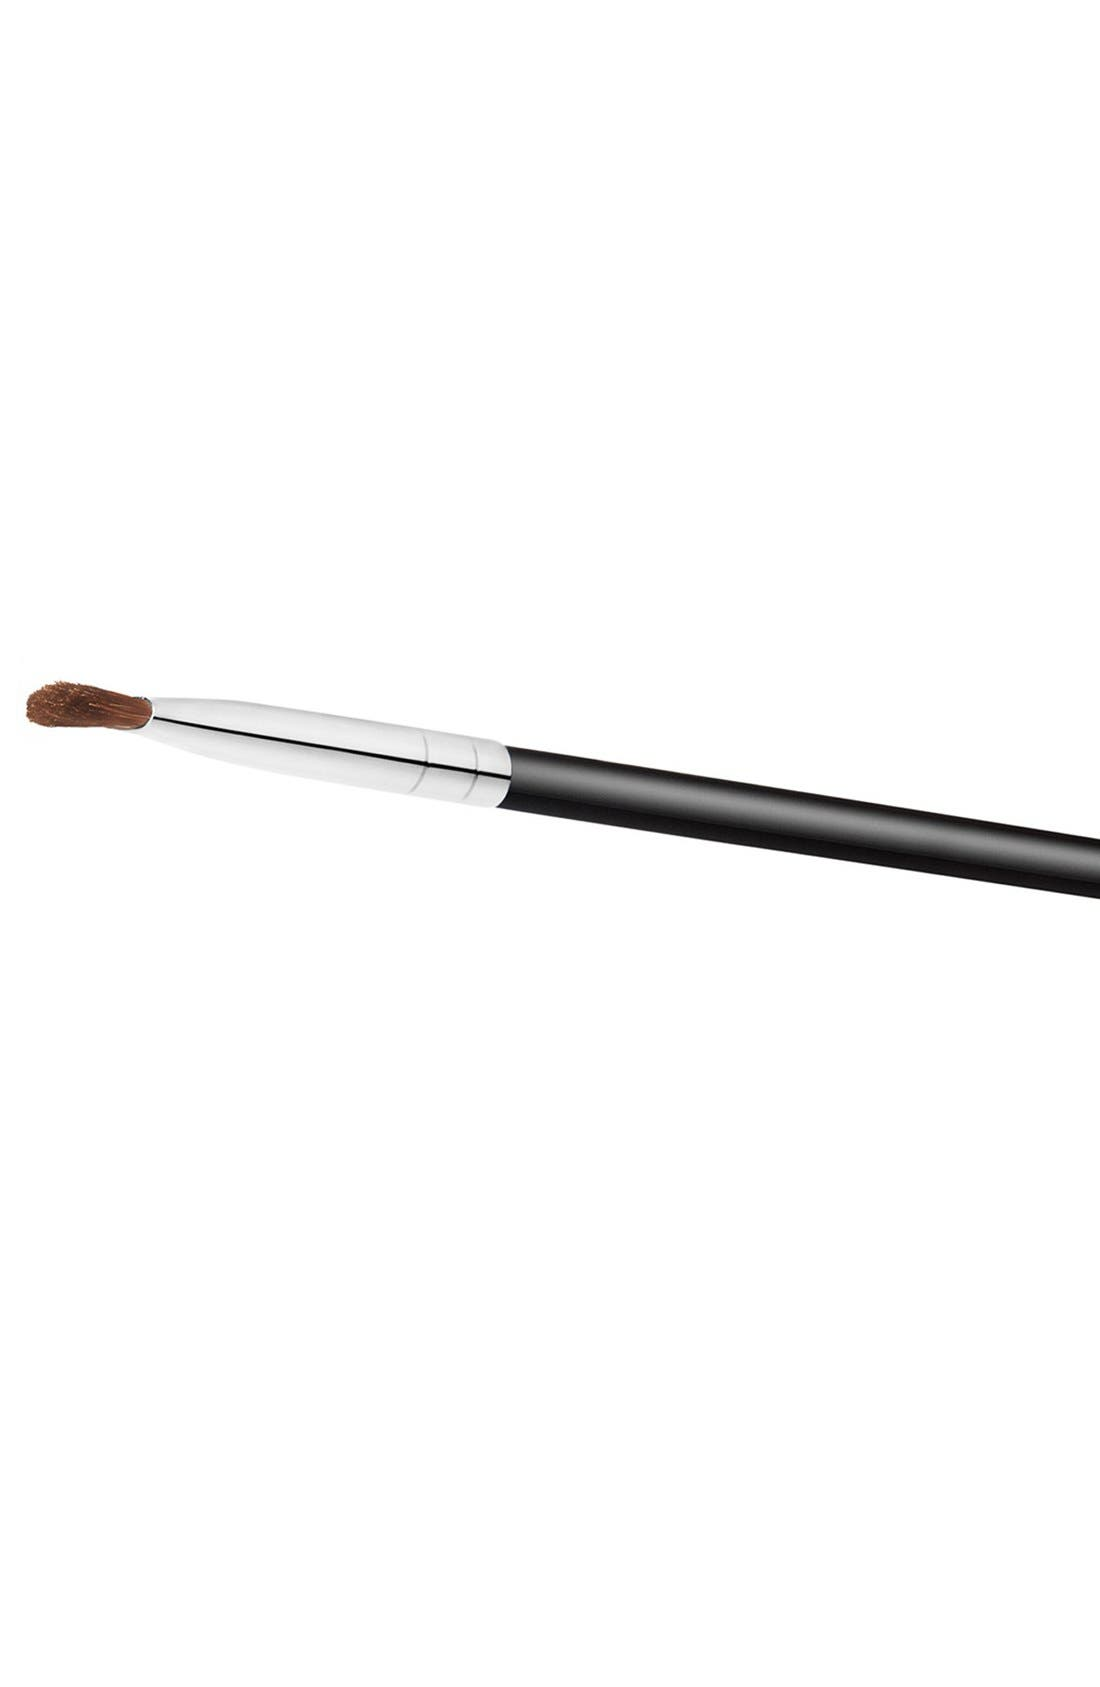 MAC 228 Mini Shader Brush,                             Alternate thumbnail 2, color,                             000